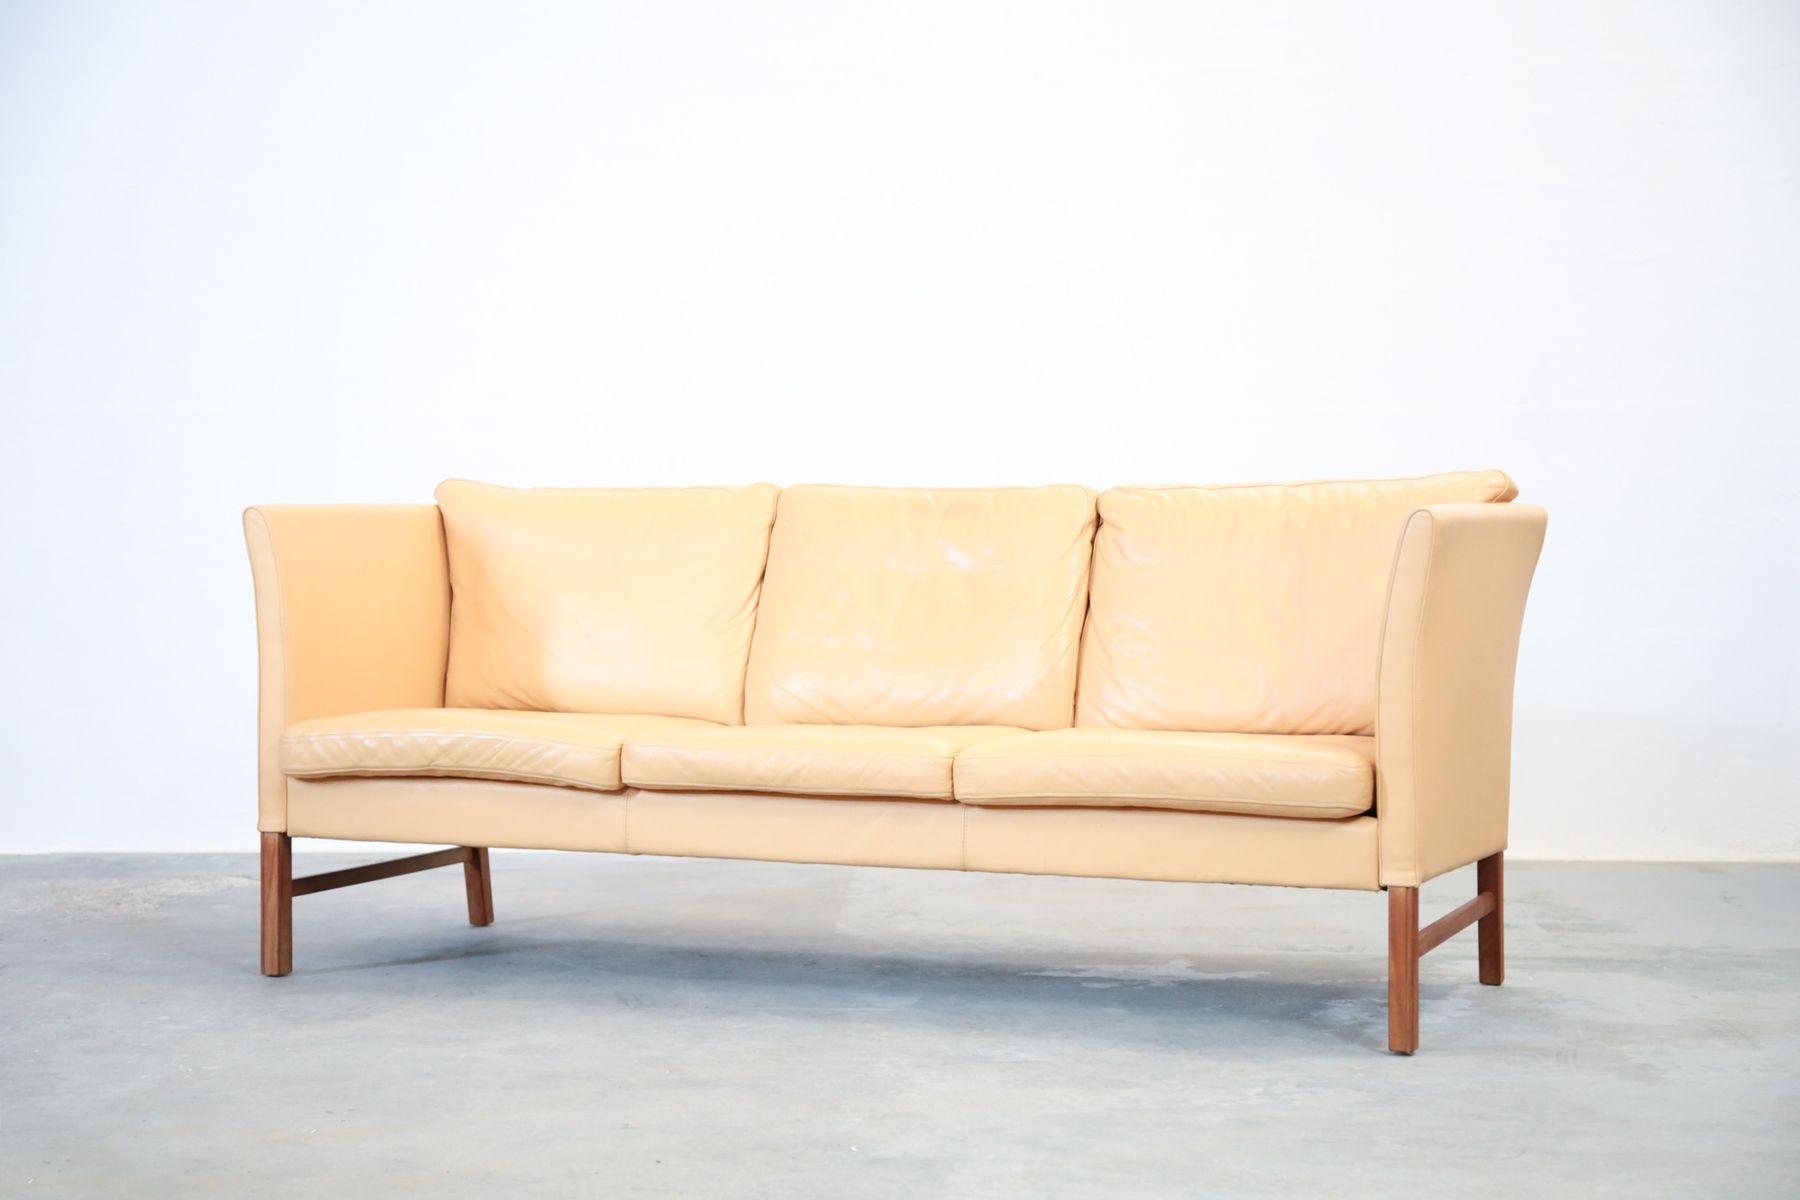 d nisches 3 sitzer ledersofa in beige 1970er bei pamono. Black Bedroom Furniture Sets. Home Design Ideas